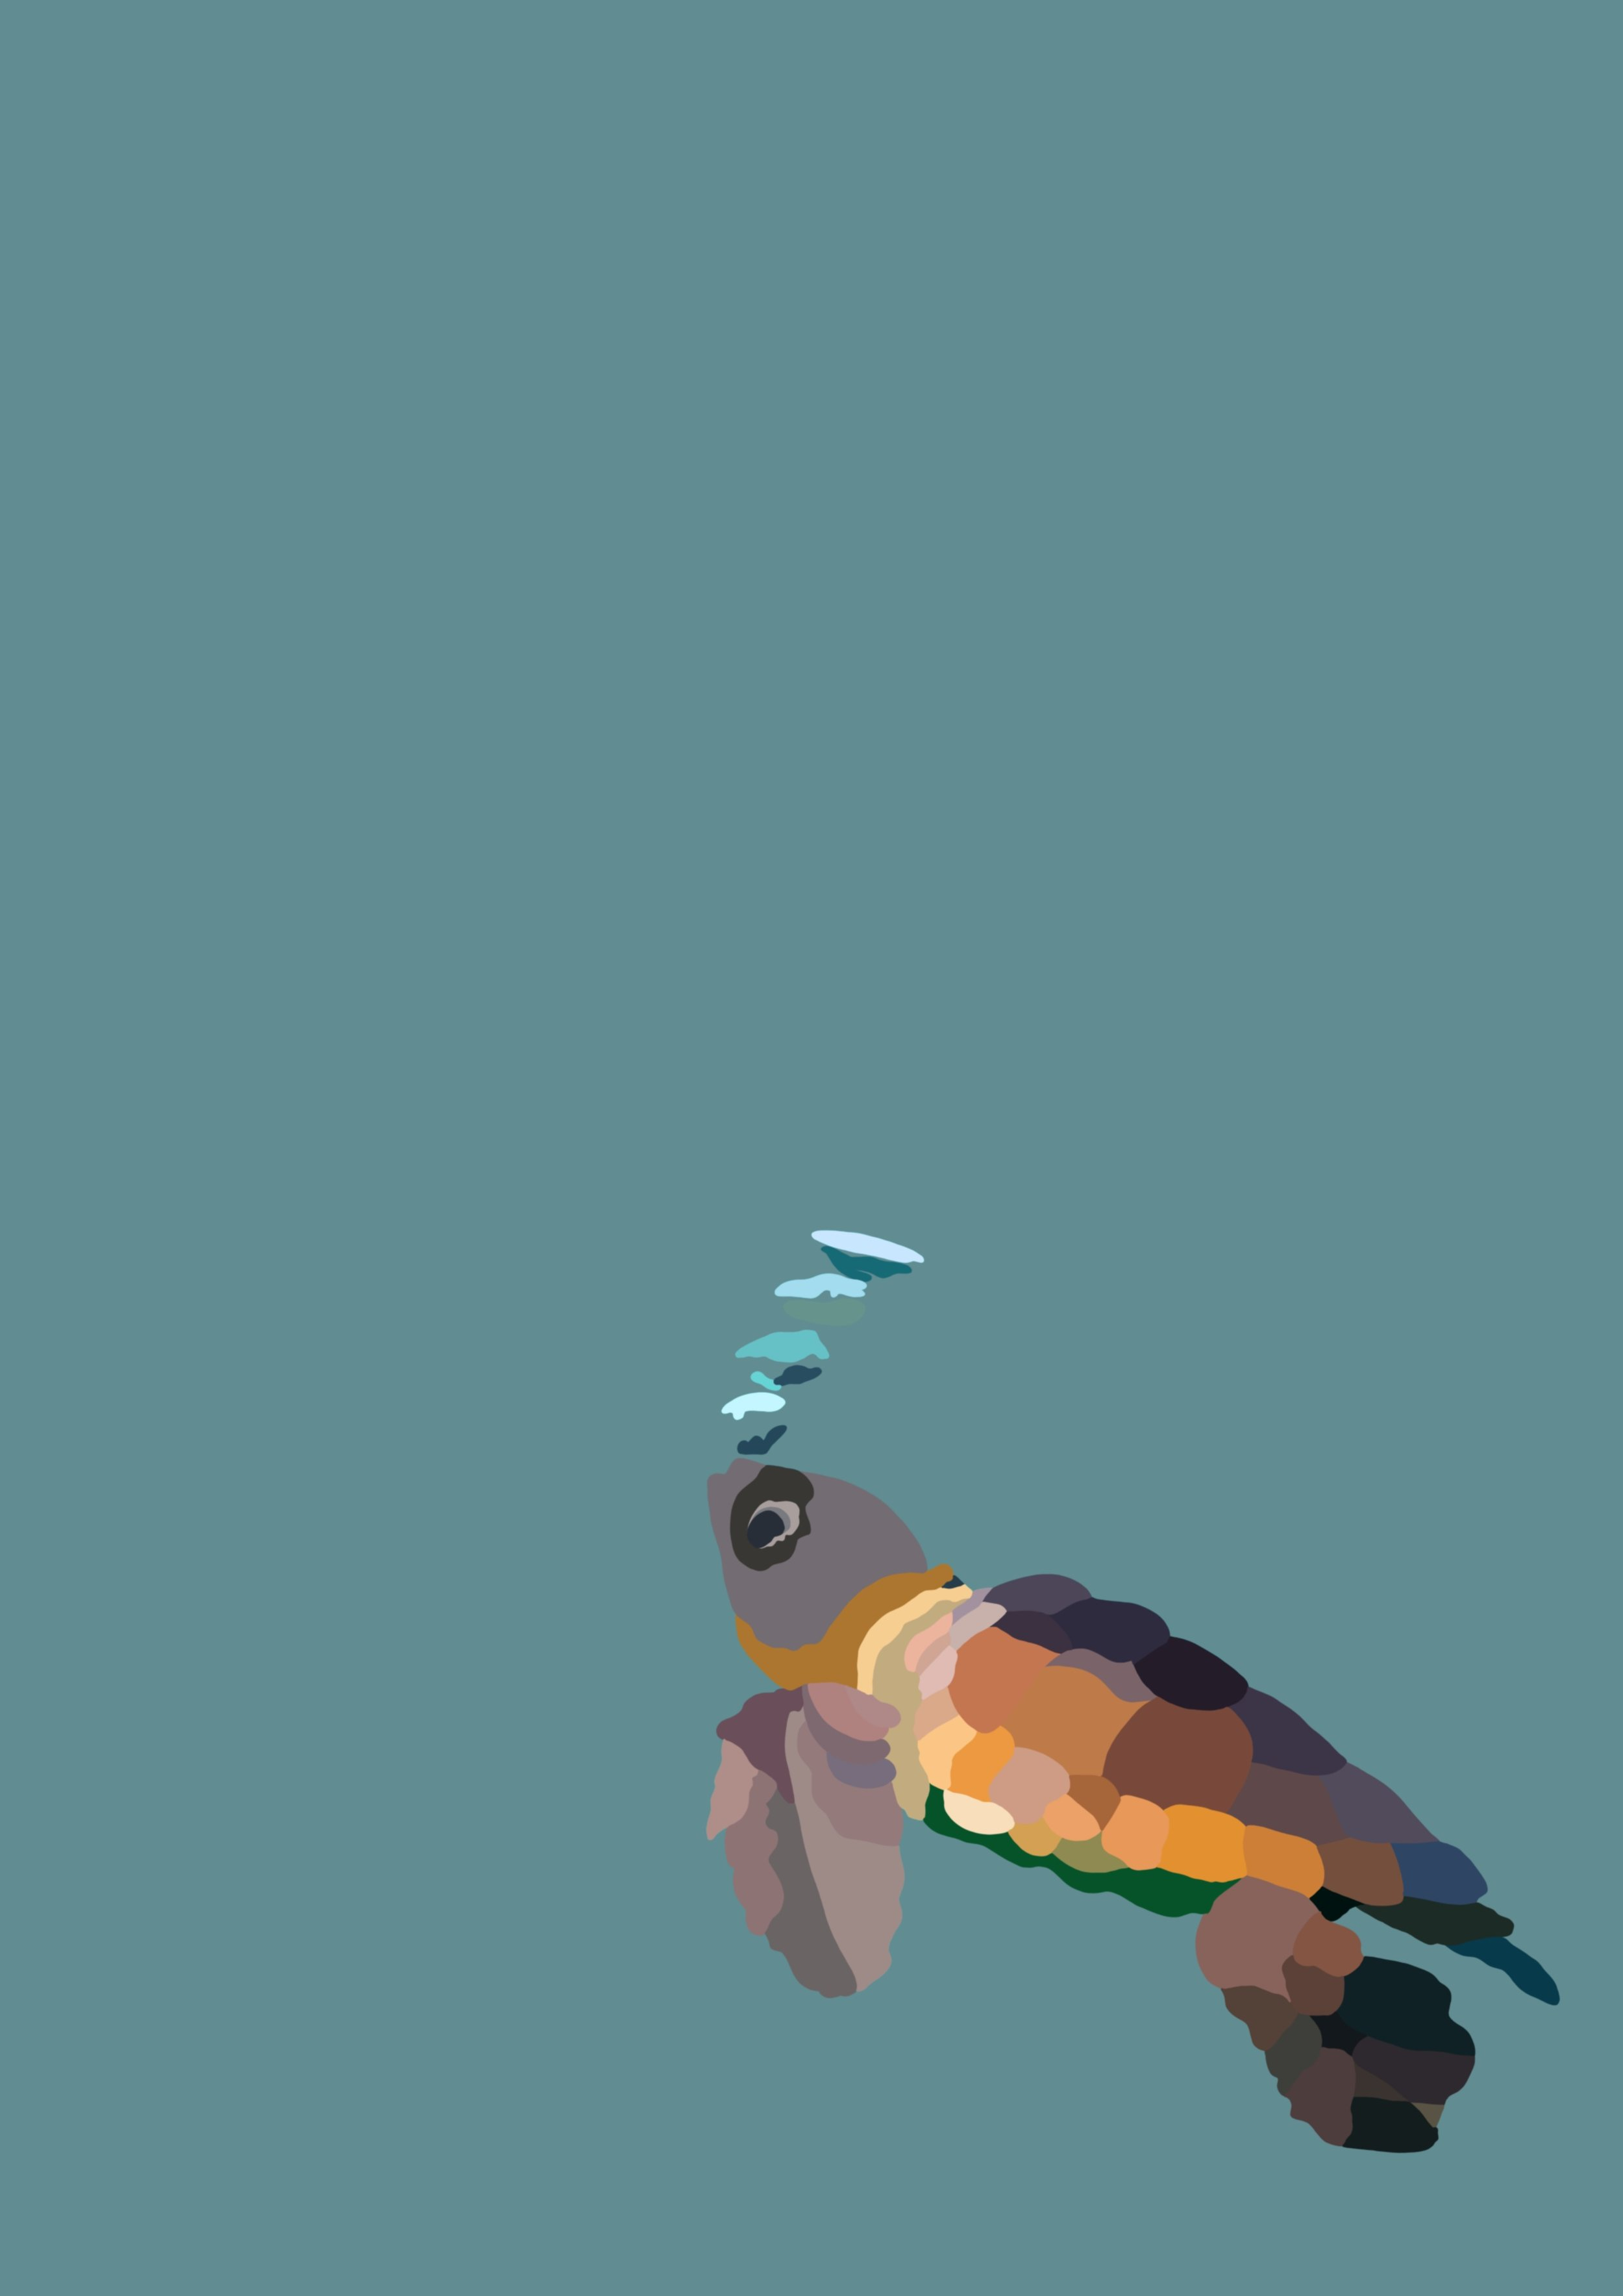 Untitled_Artwork-10.jpg